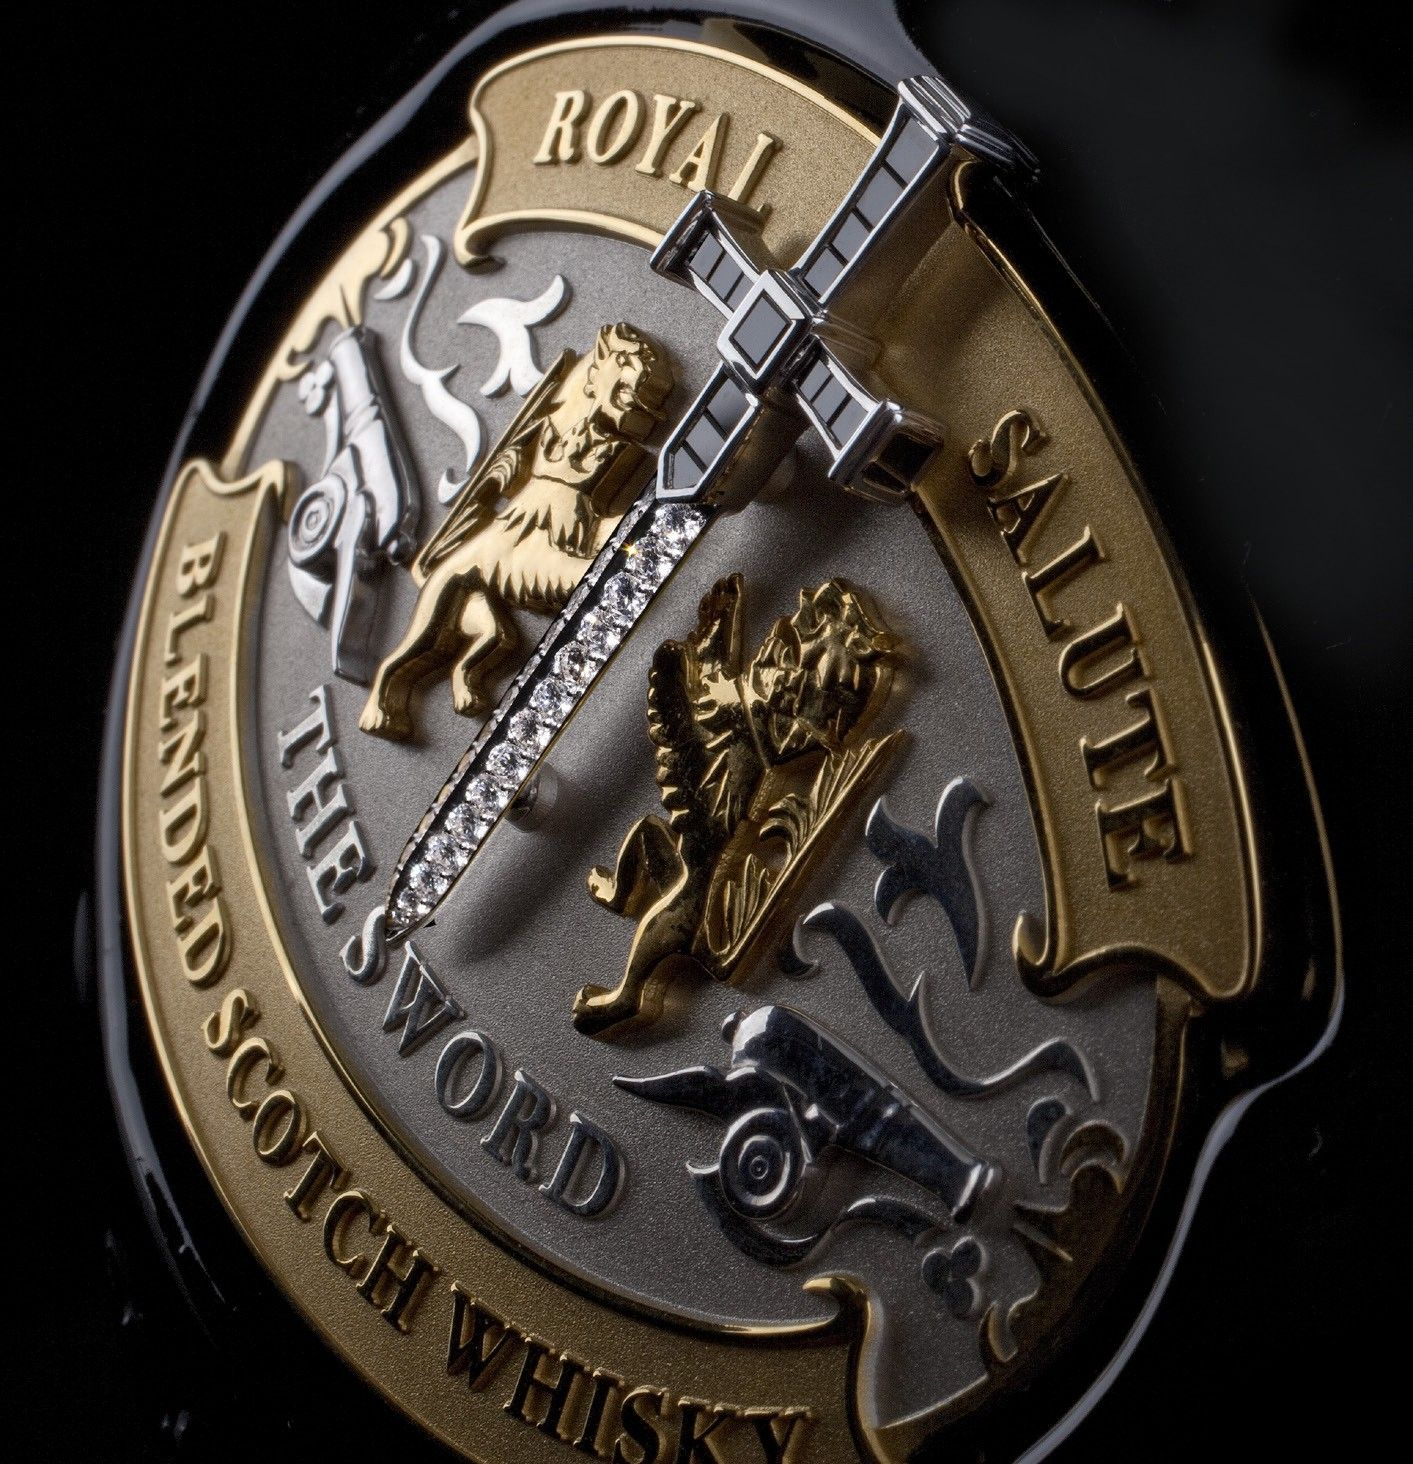 Royal Salute, whisky, Tribute of Honour